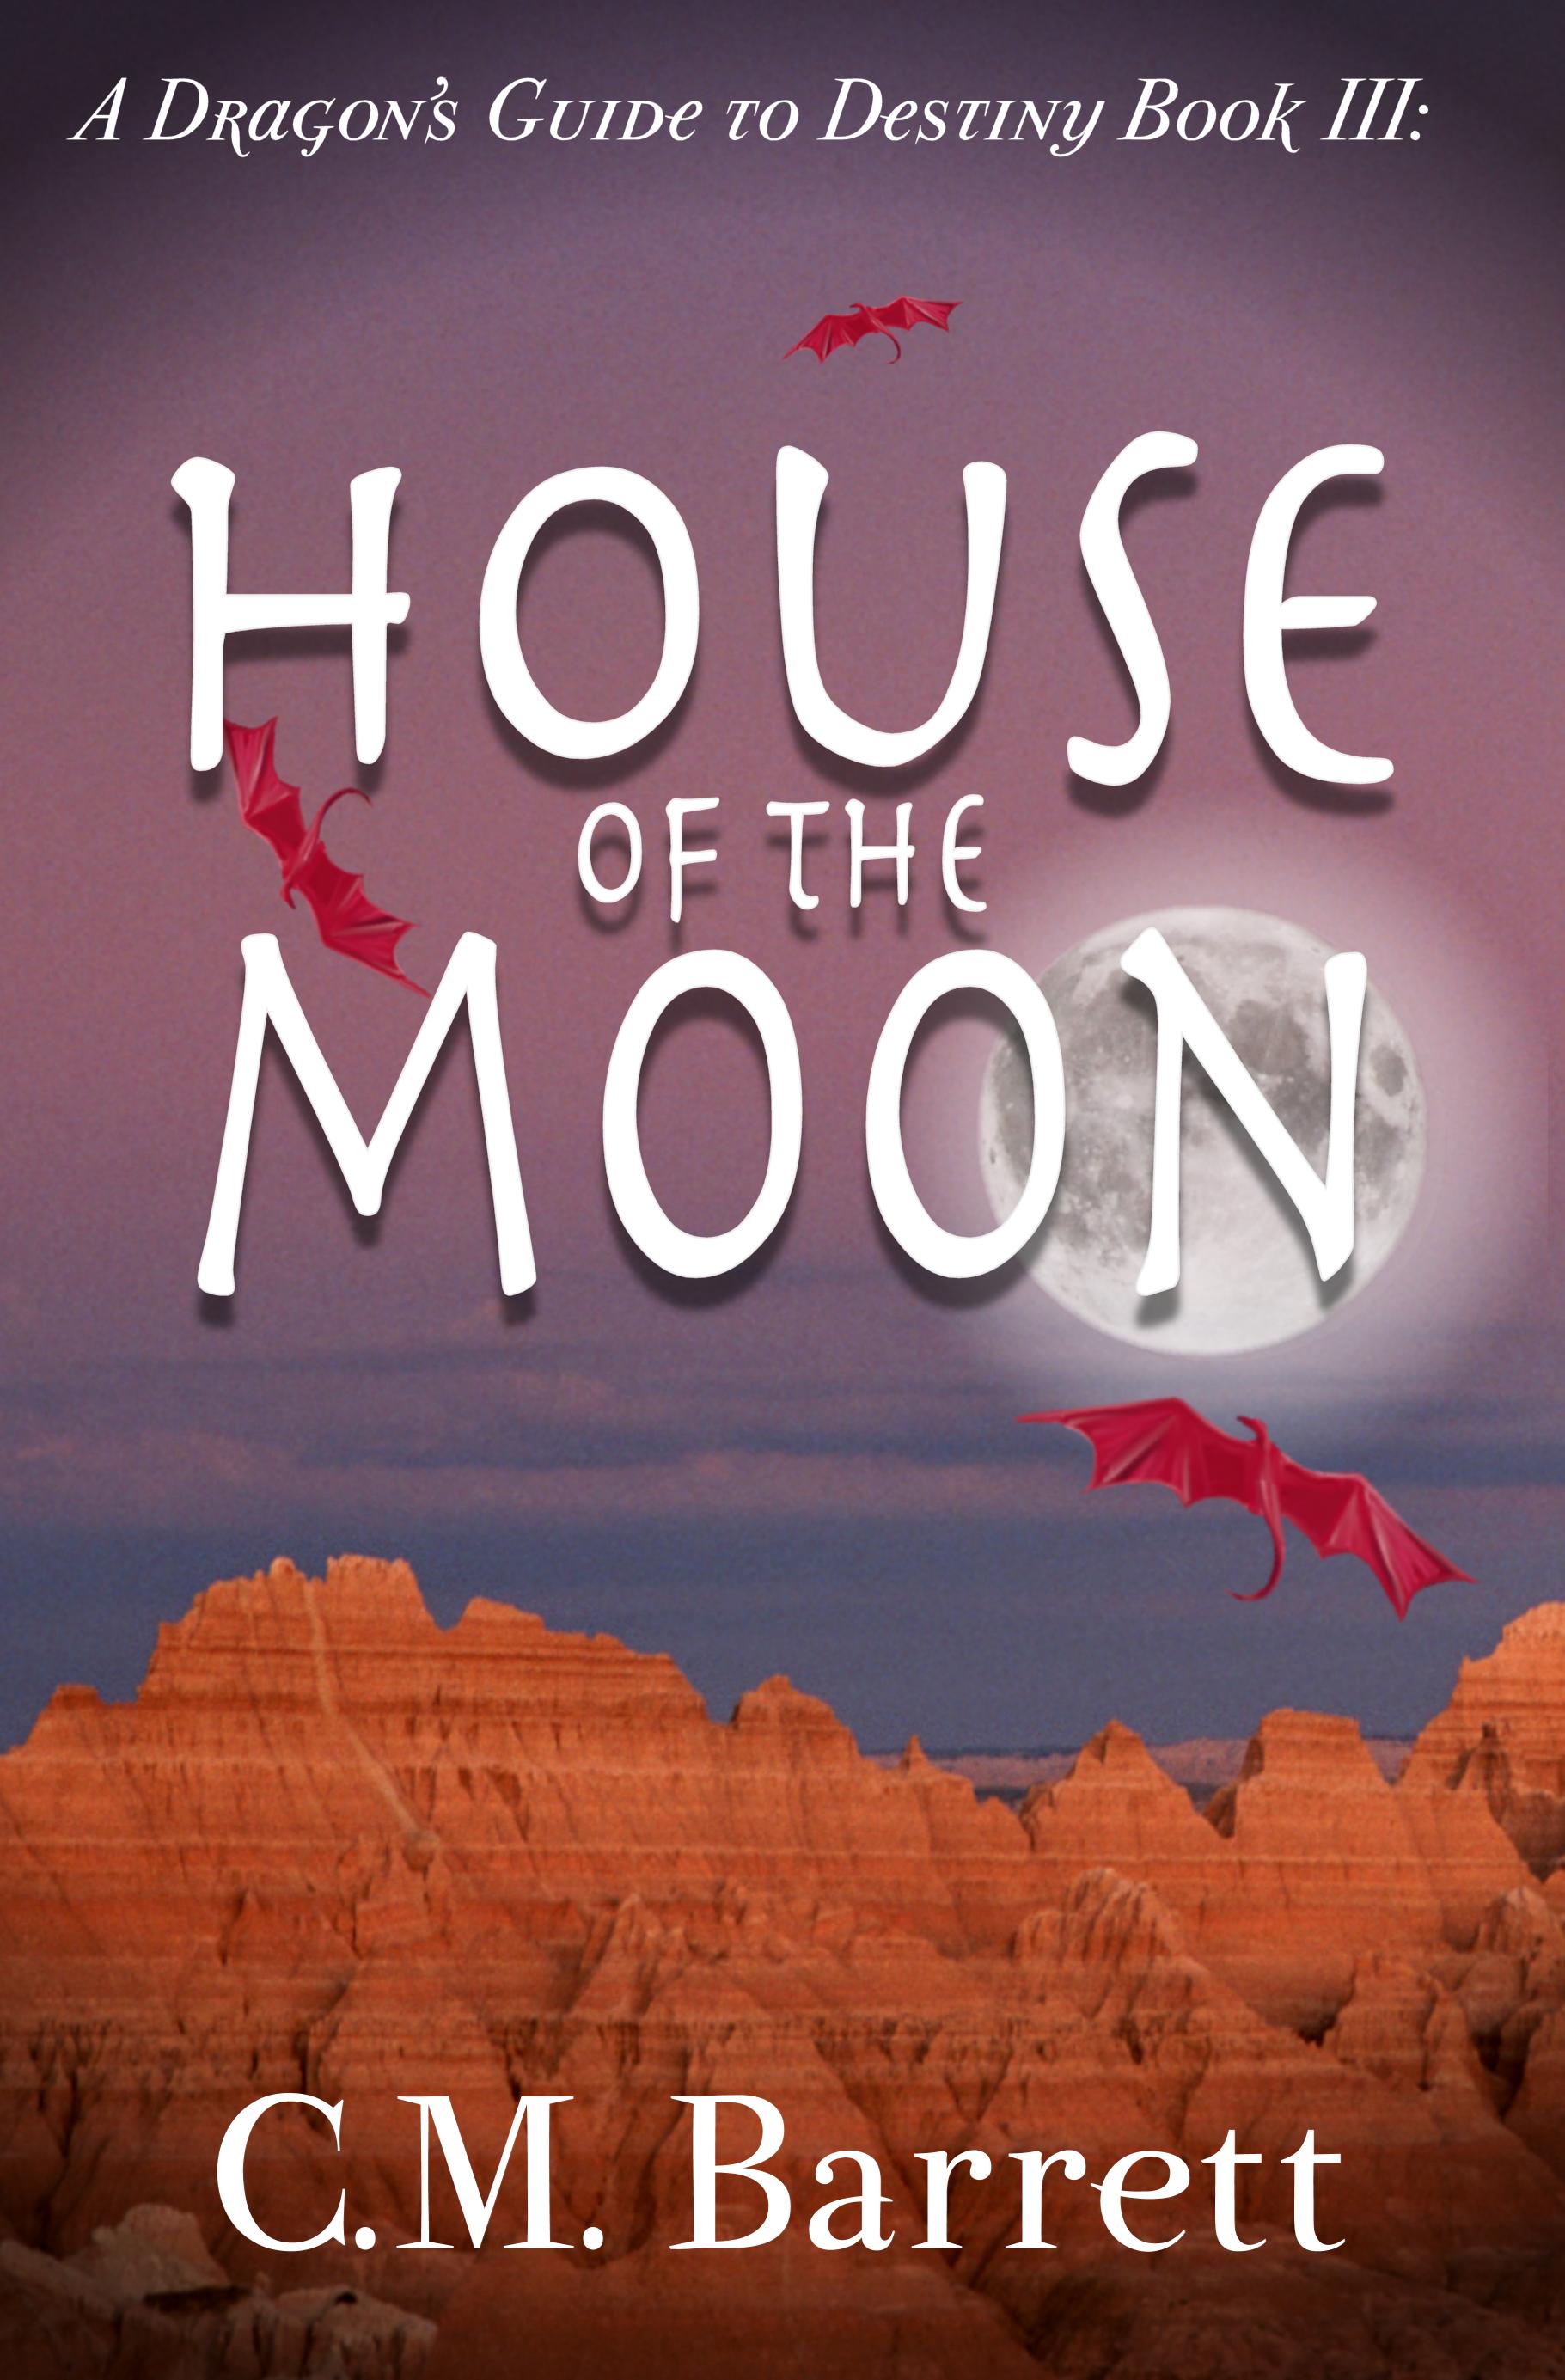 C. M. Barrett - House of the Moon